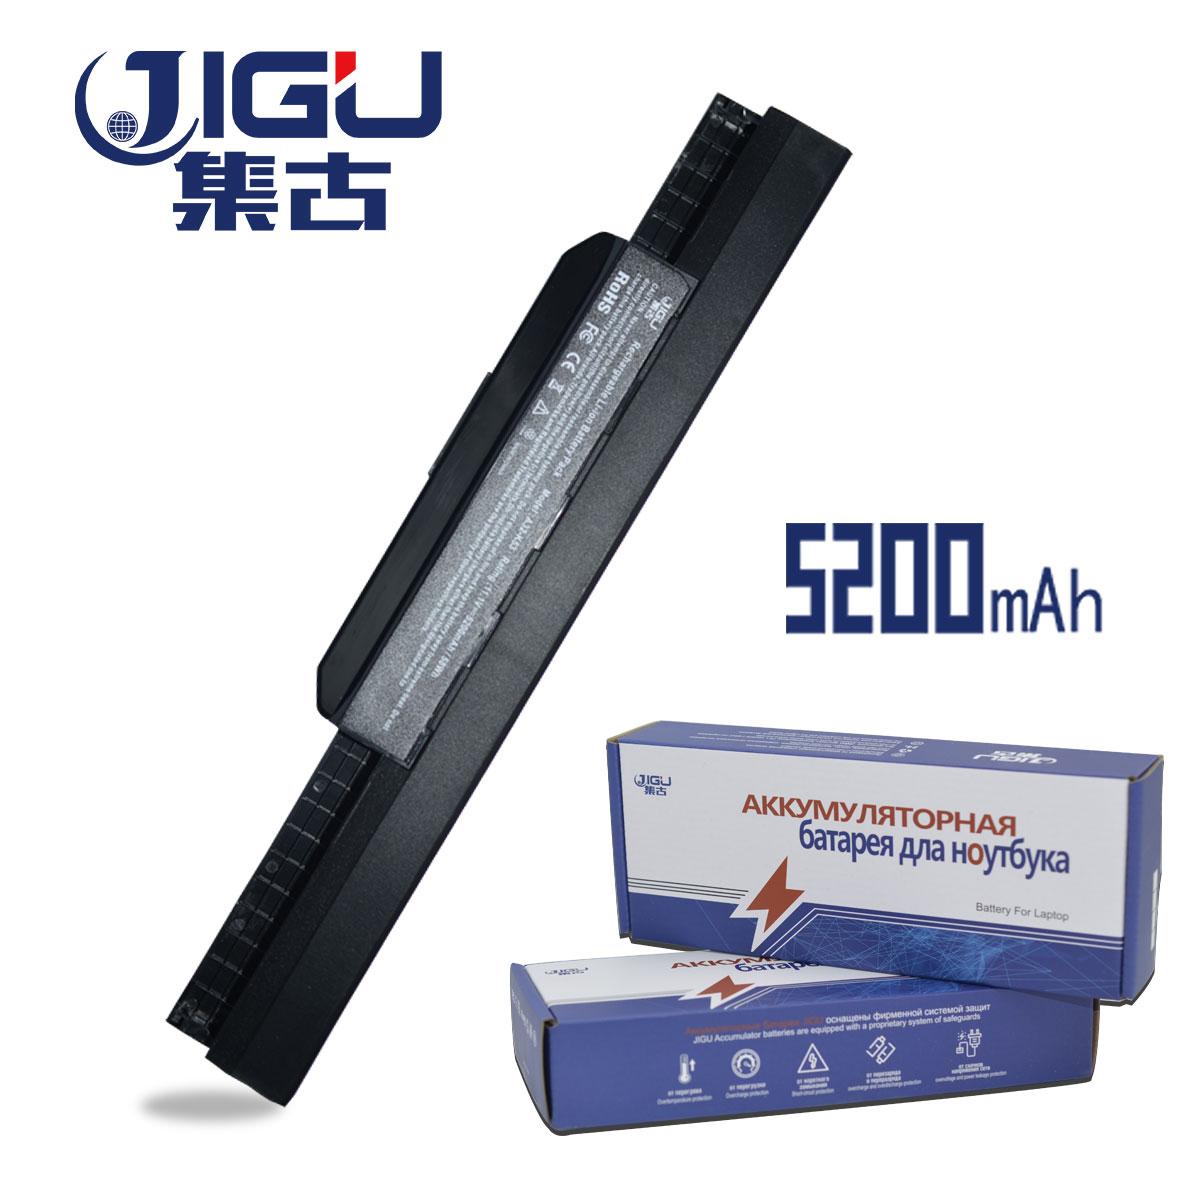 JIGU Laptop Battery A31-K53 A32-K53 A41-K53 A42-K53 For Asus x53s A43 A53s K43 K53 k53s k53U X43 A43B A53B K53B X43B Series цена